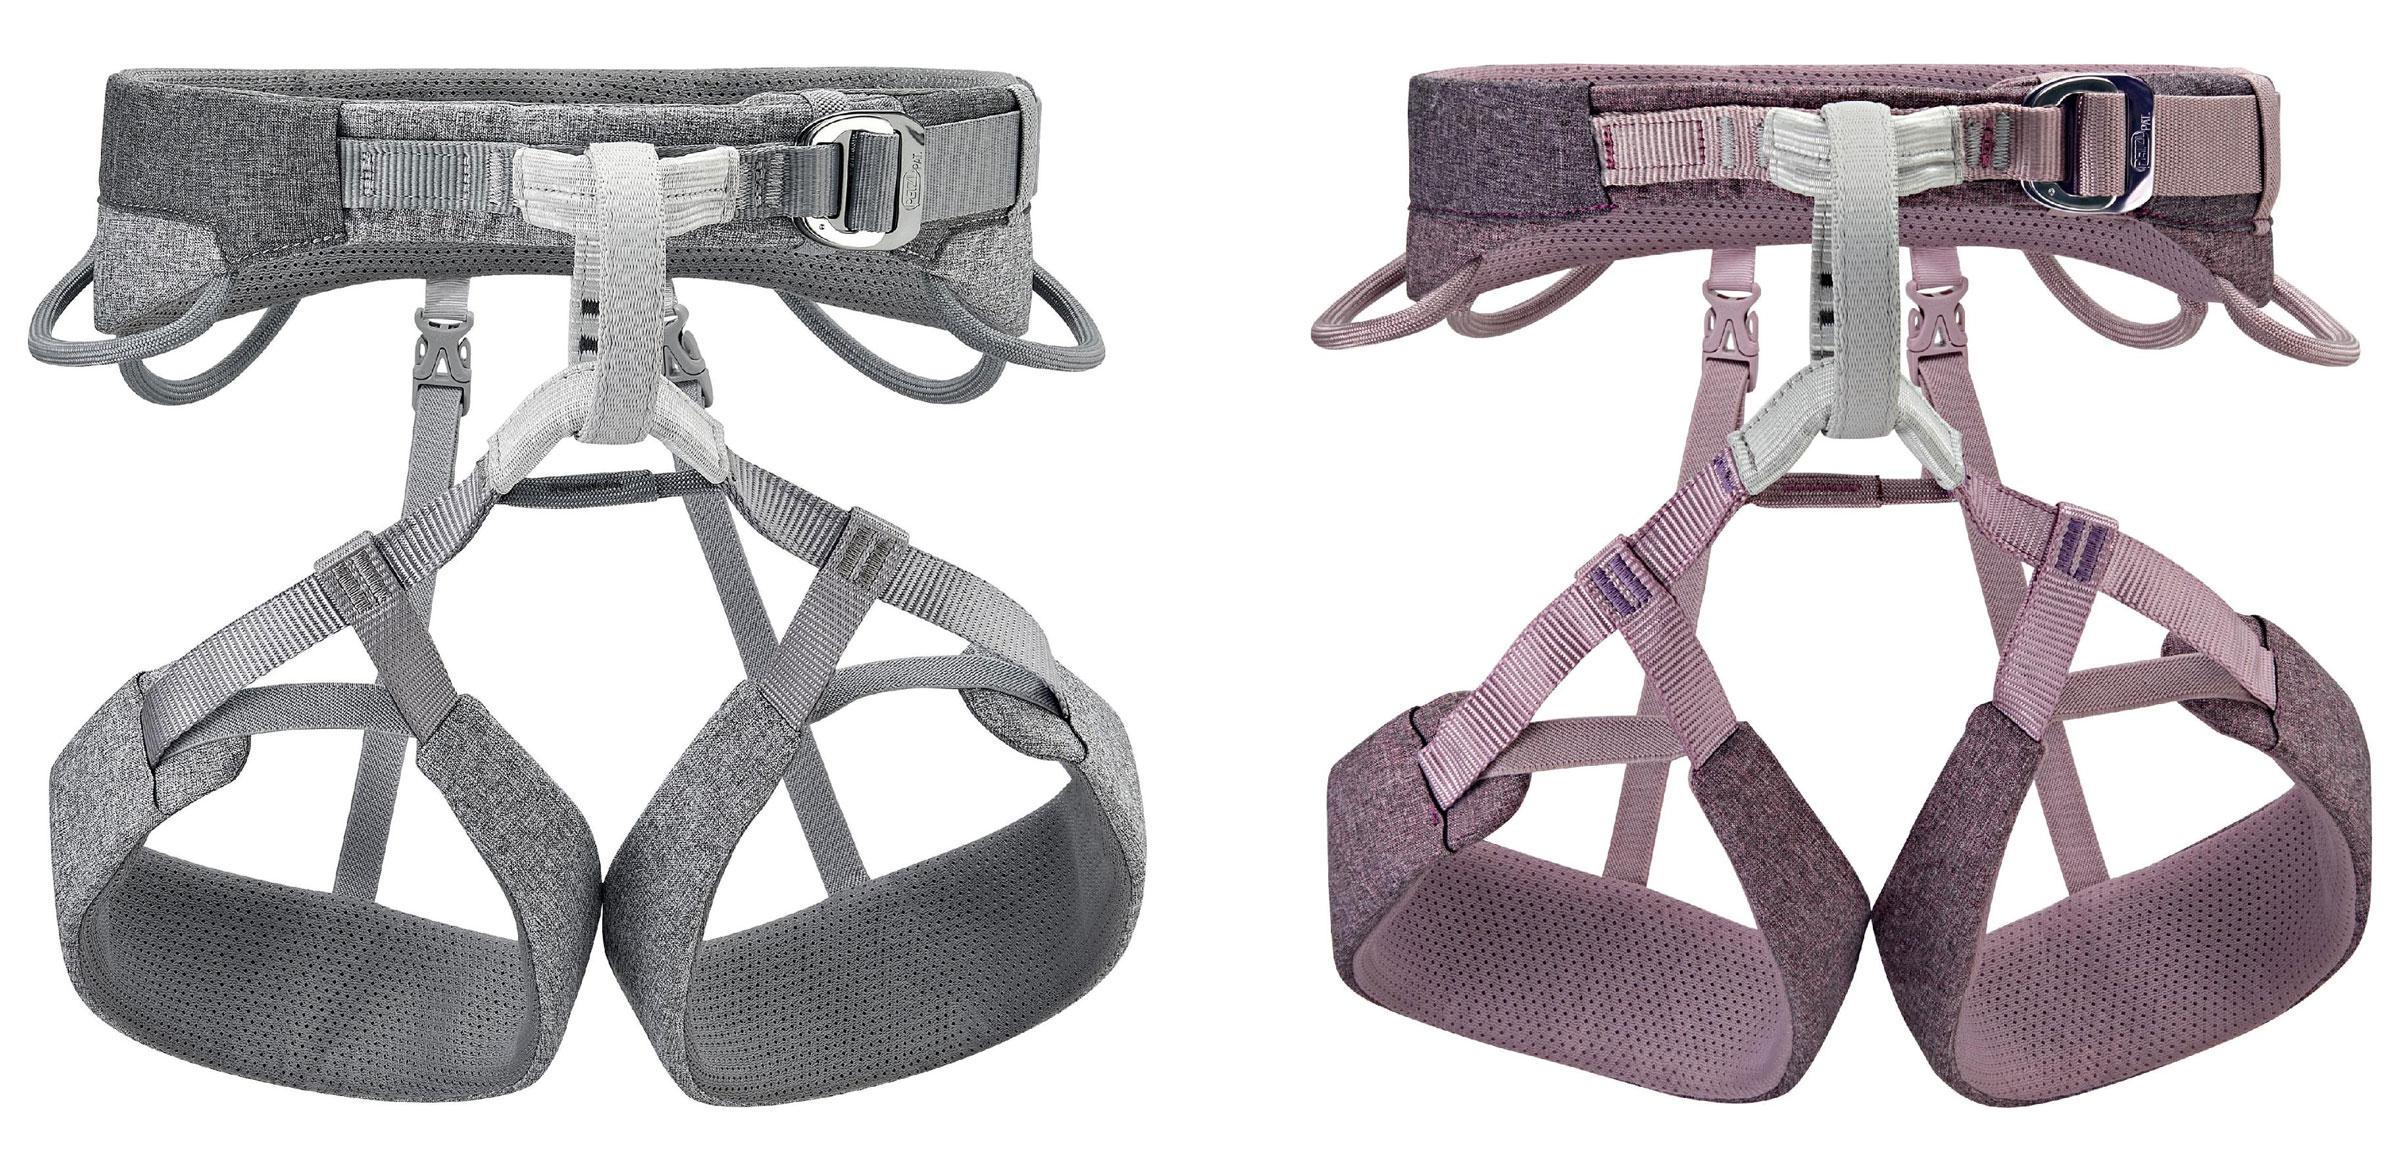 petzl sama & selena climbing harness